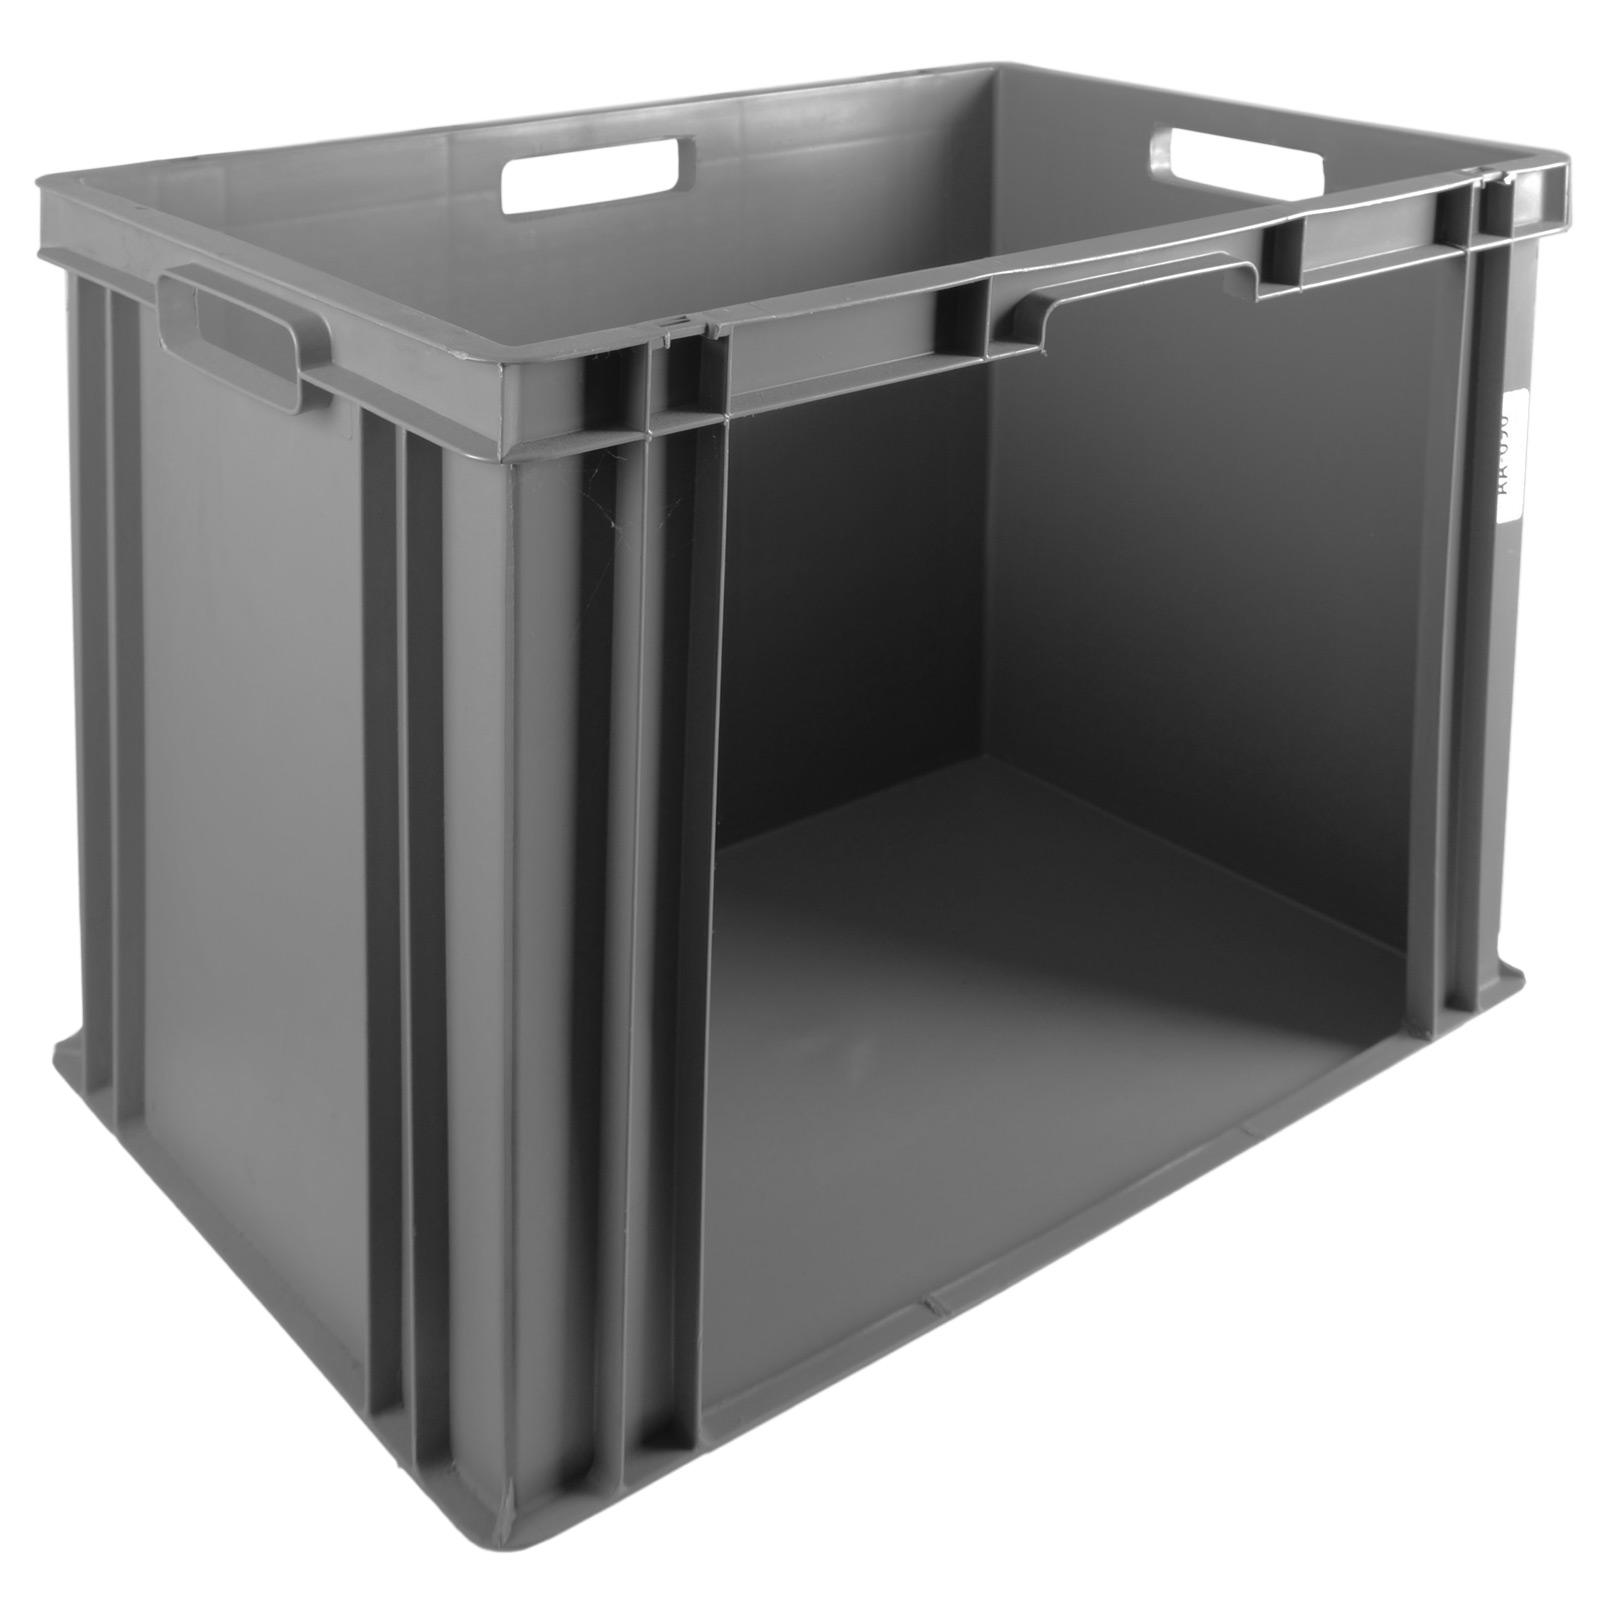 20x Grey Picking Boxes Warehouse Storage Bins Open